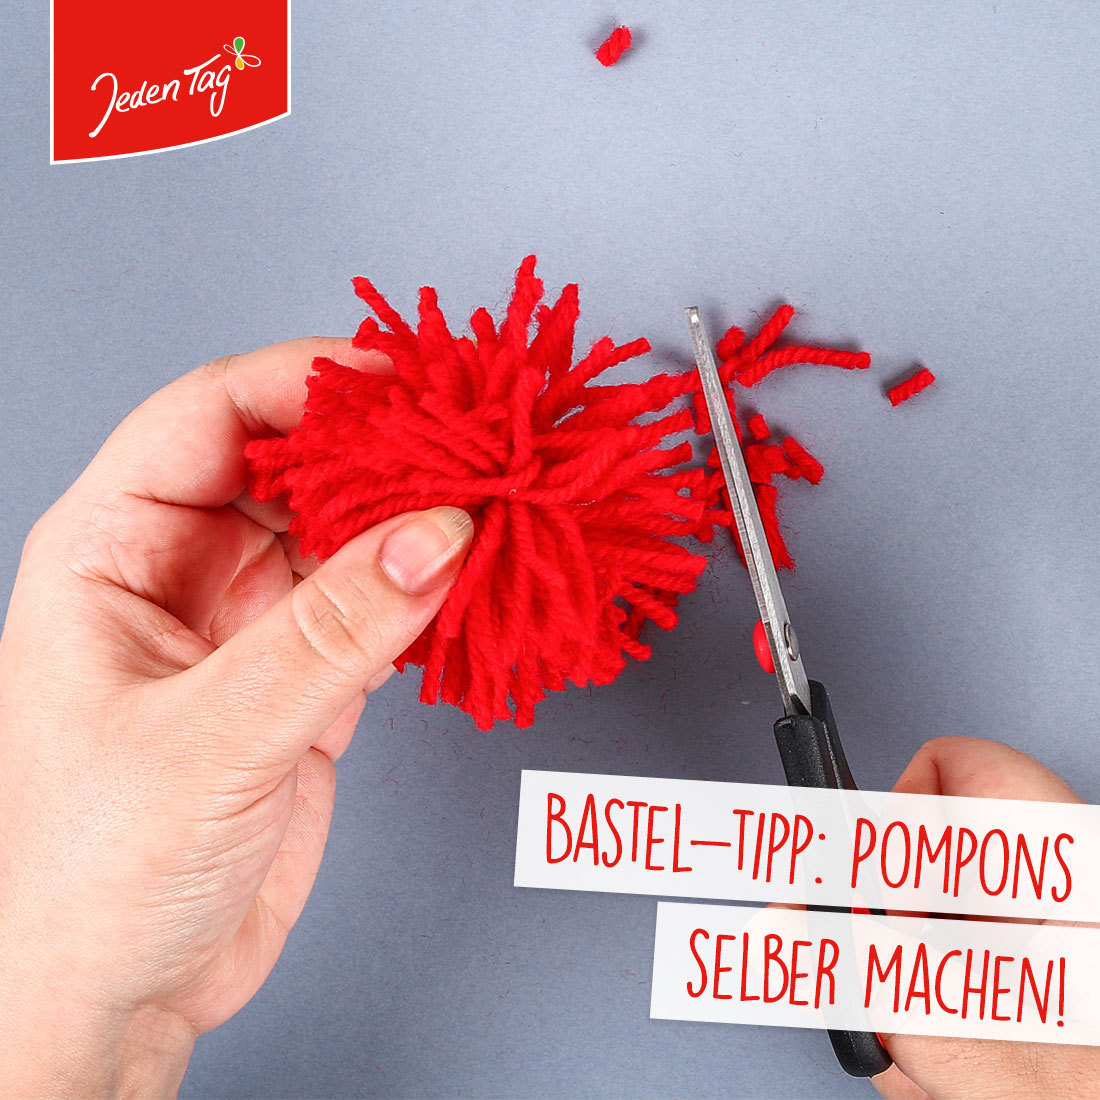 Jeden Tag Bastel-Tipp: Pompons selber machen